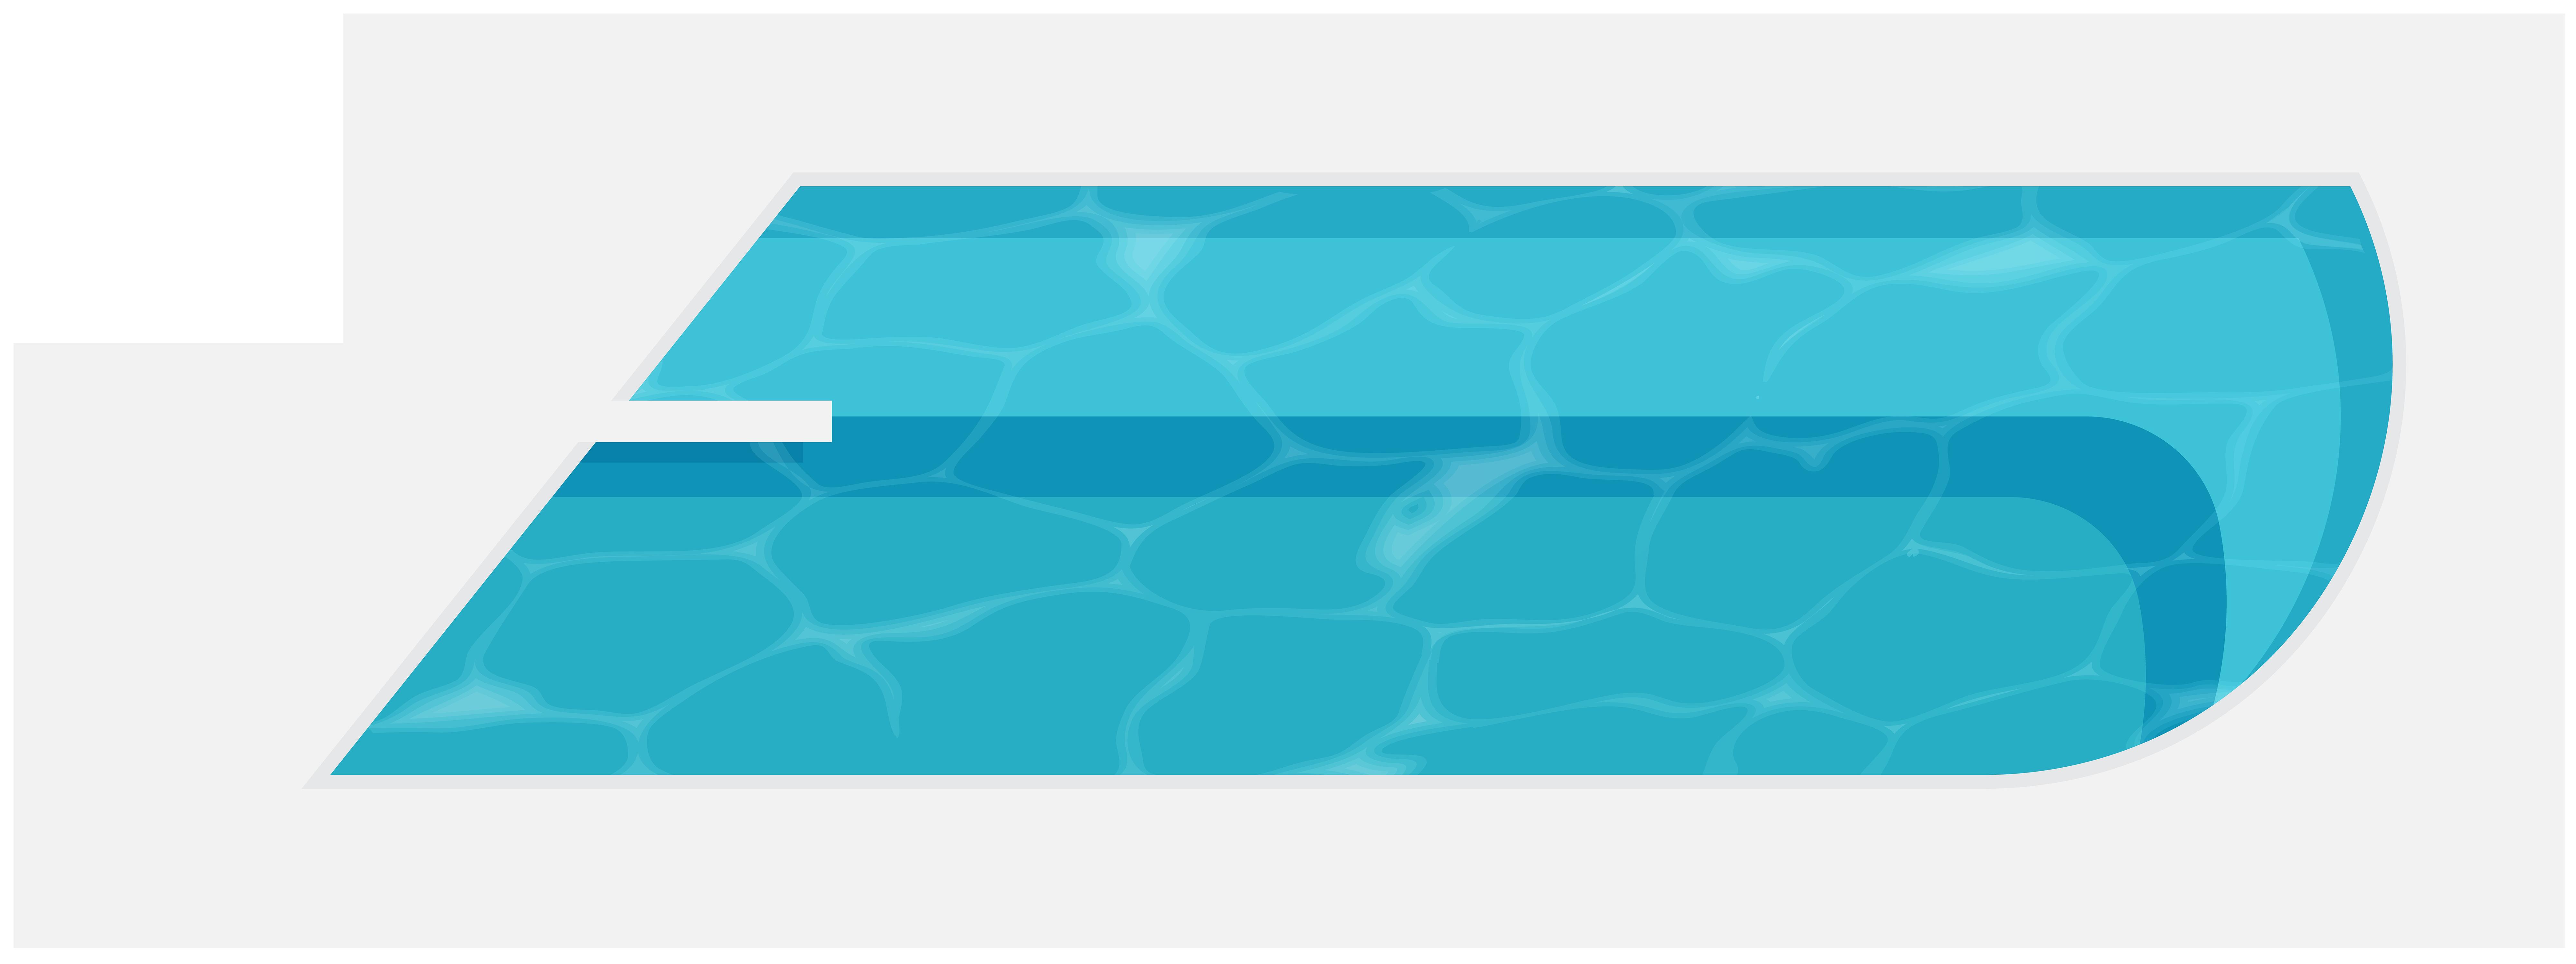 8000x2995 Swimming Pool Png Clip Art